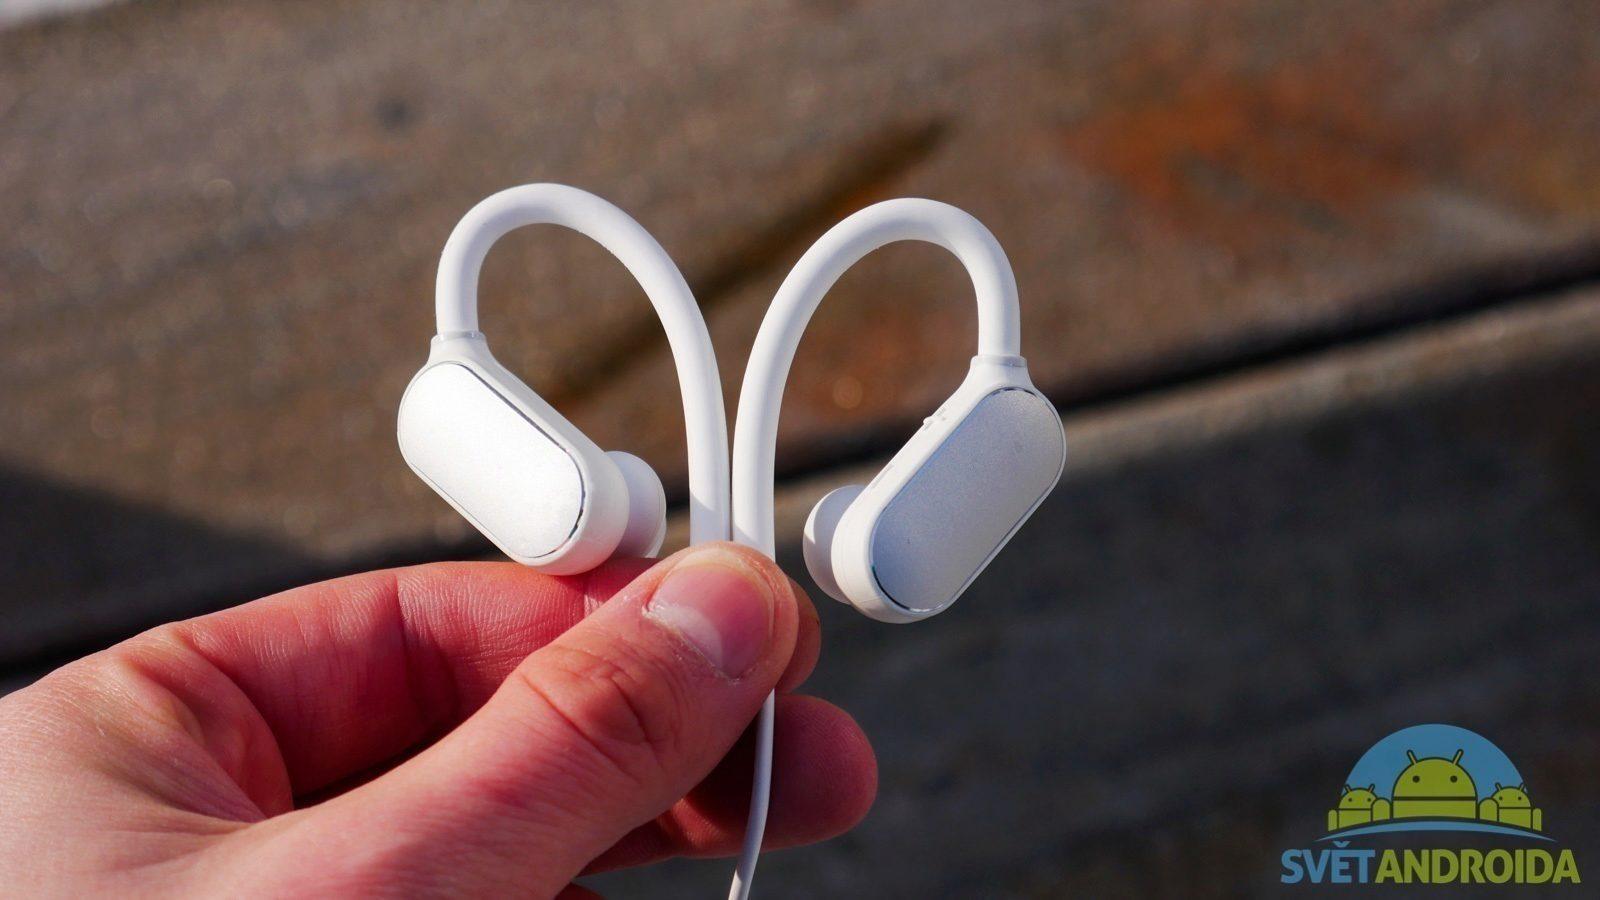 Xiaomi Mi Sports Bluetooth Bezdrtov Sluchtka Stvoen Pro Original Sport Wireless Headset Earphone Headphone Specifikace